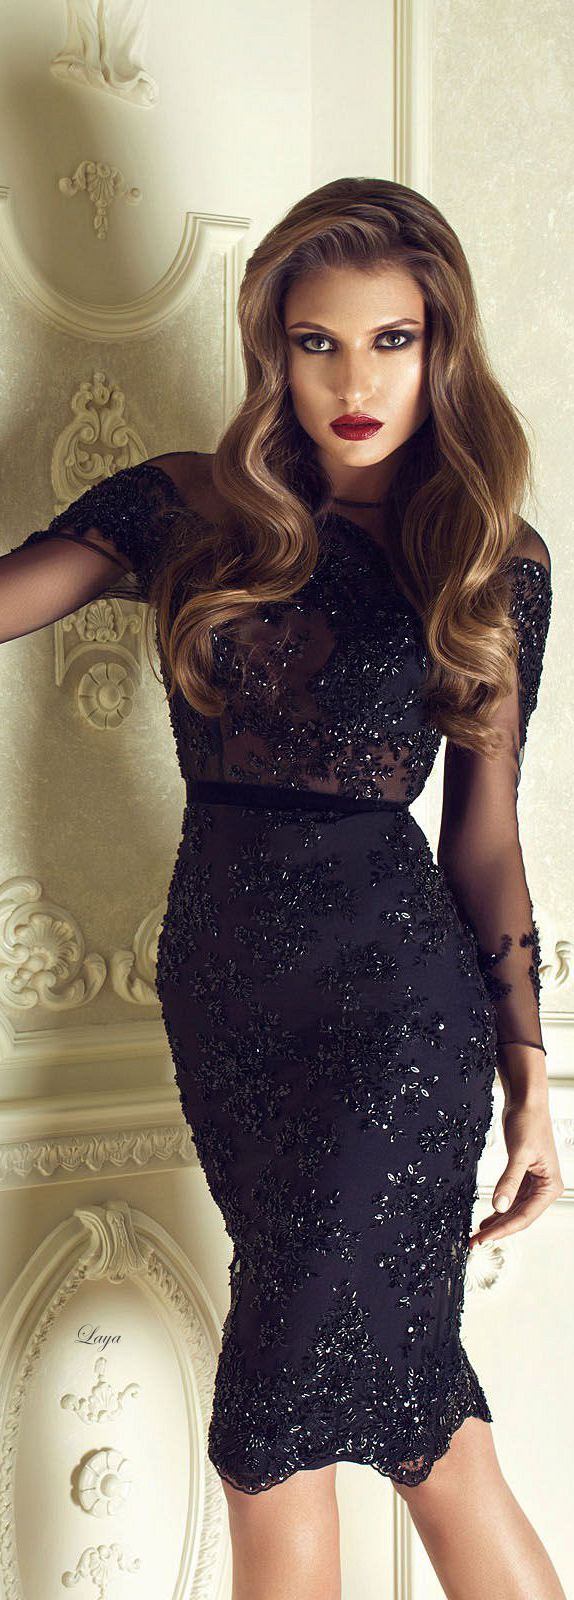 Cristallini fallwinter fw pinterest dresses fashion